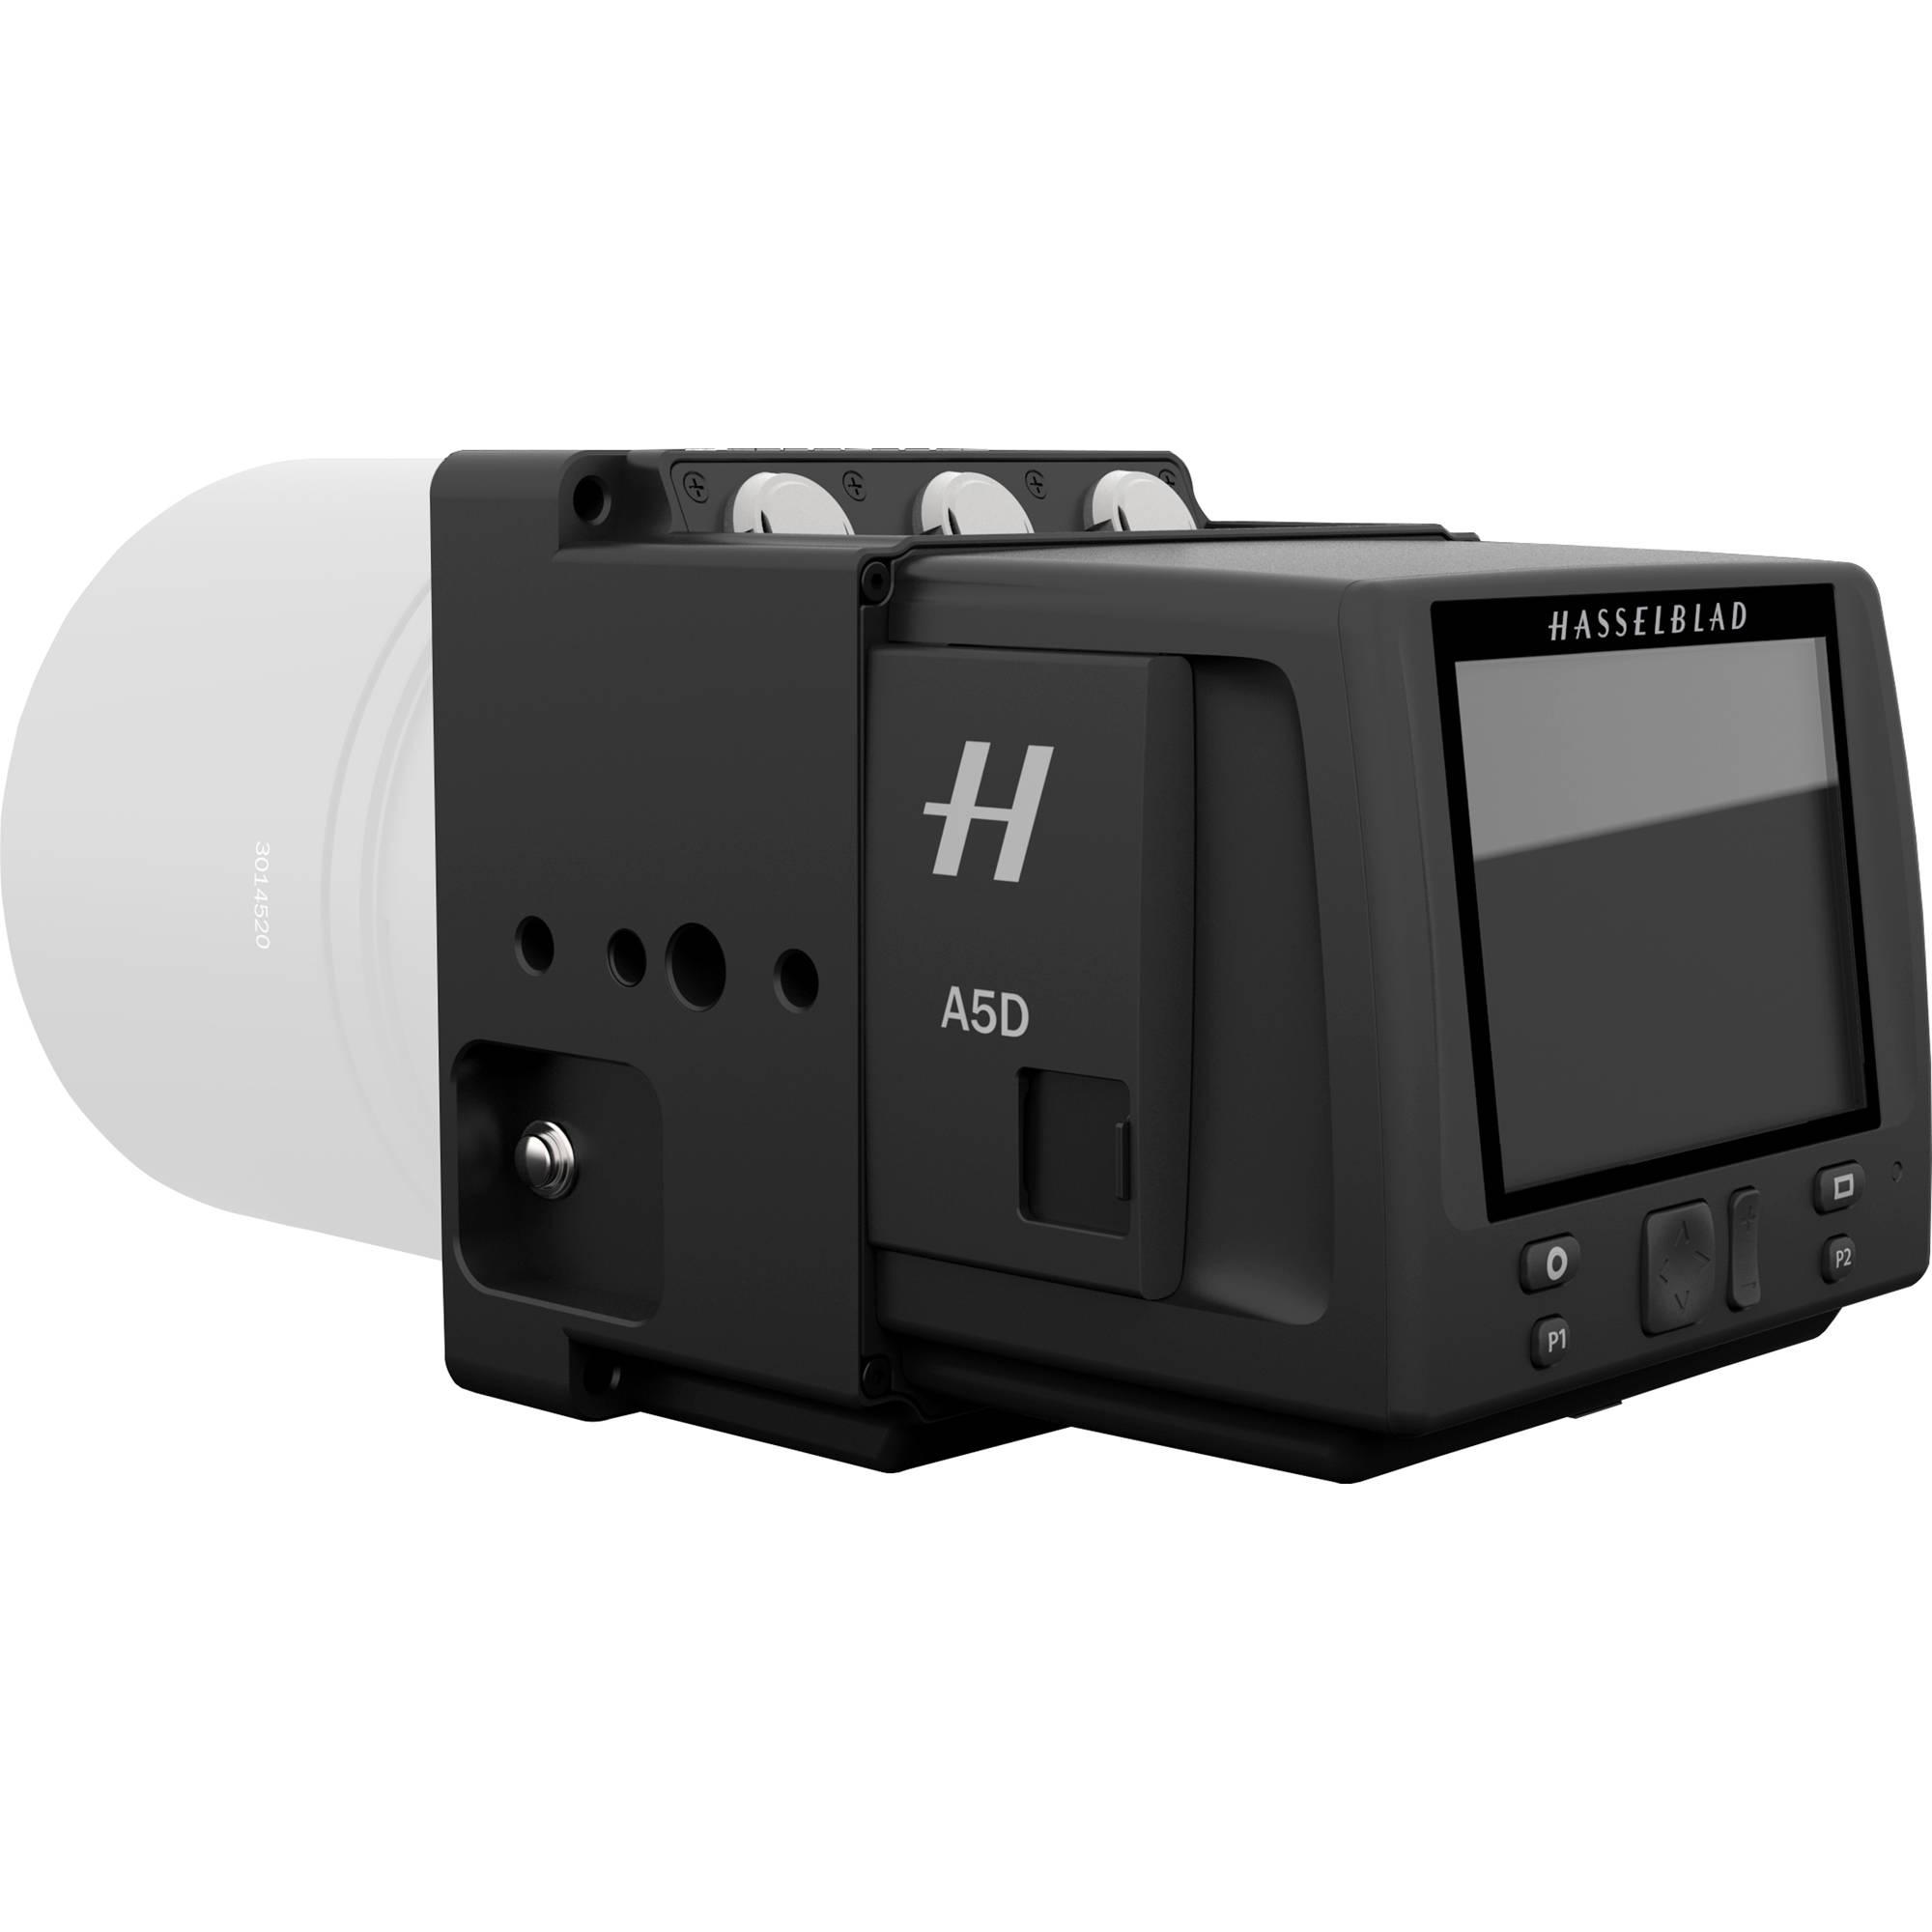 Hasselblad A5D 80 Aerial Digital Camera